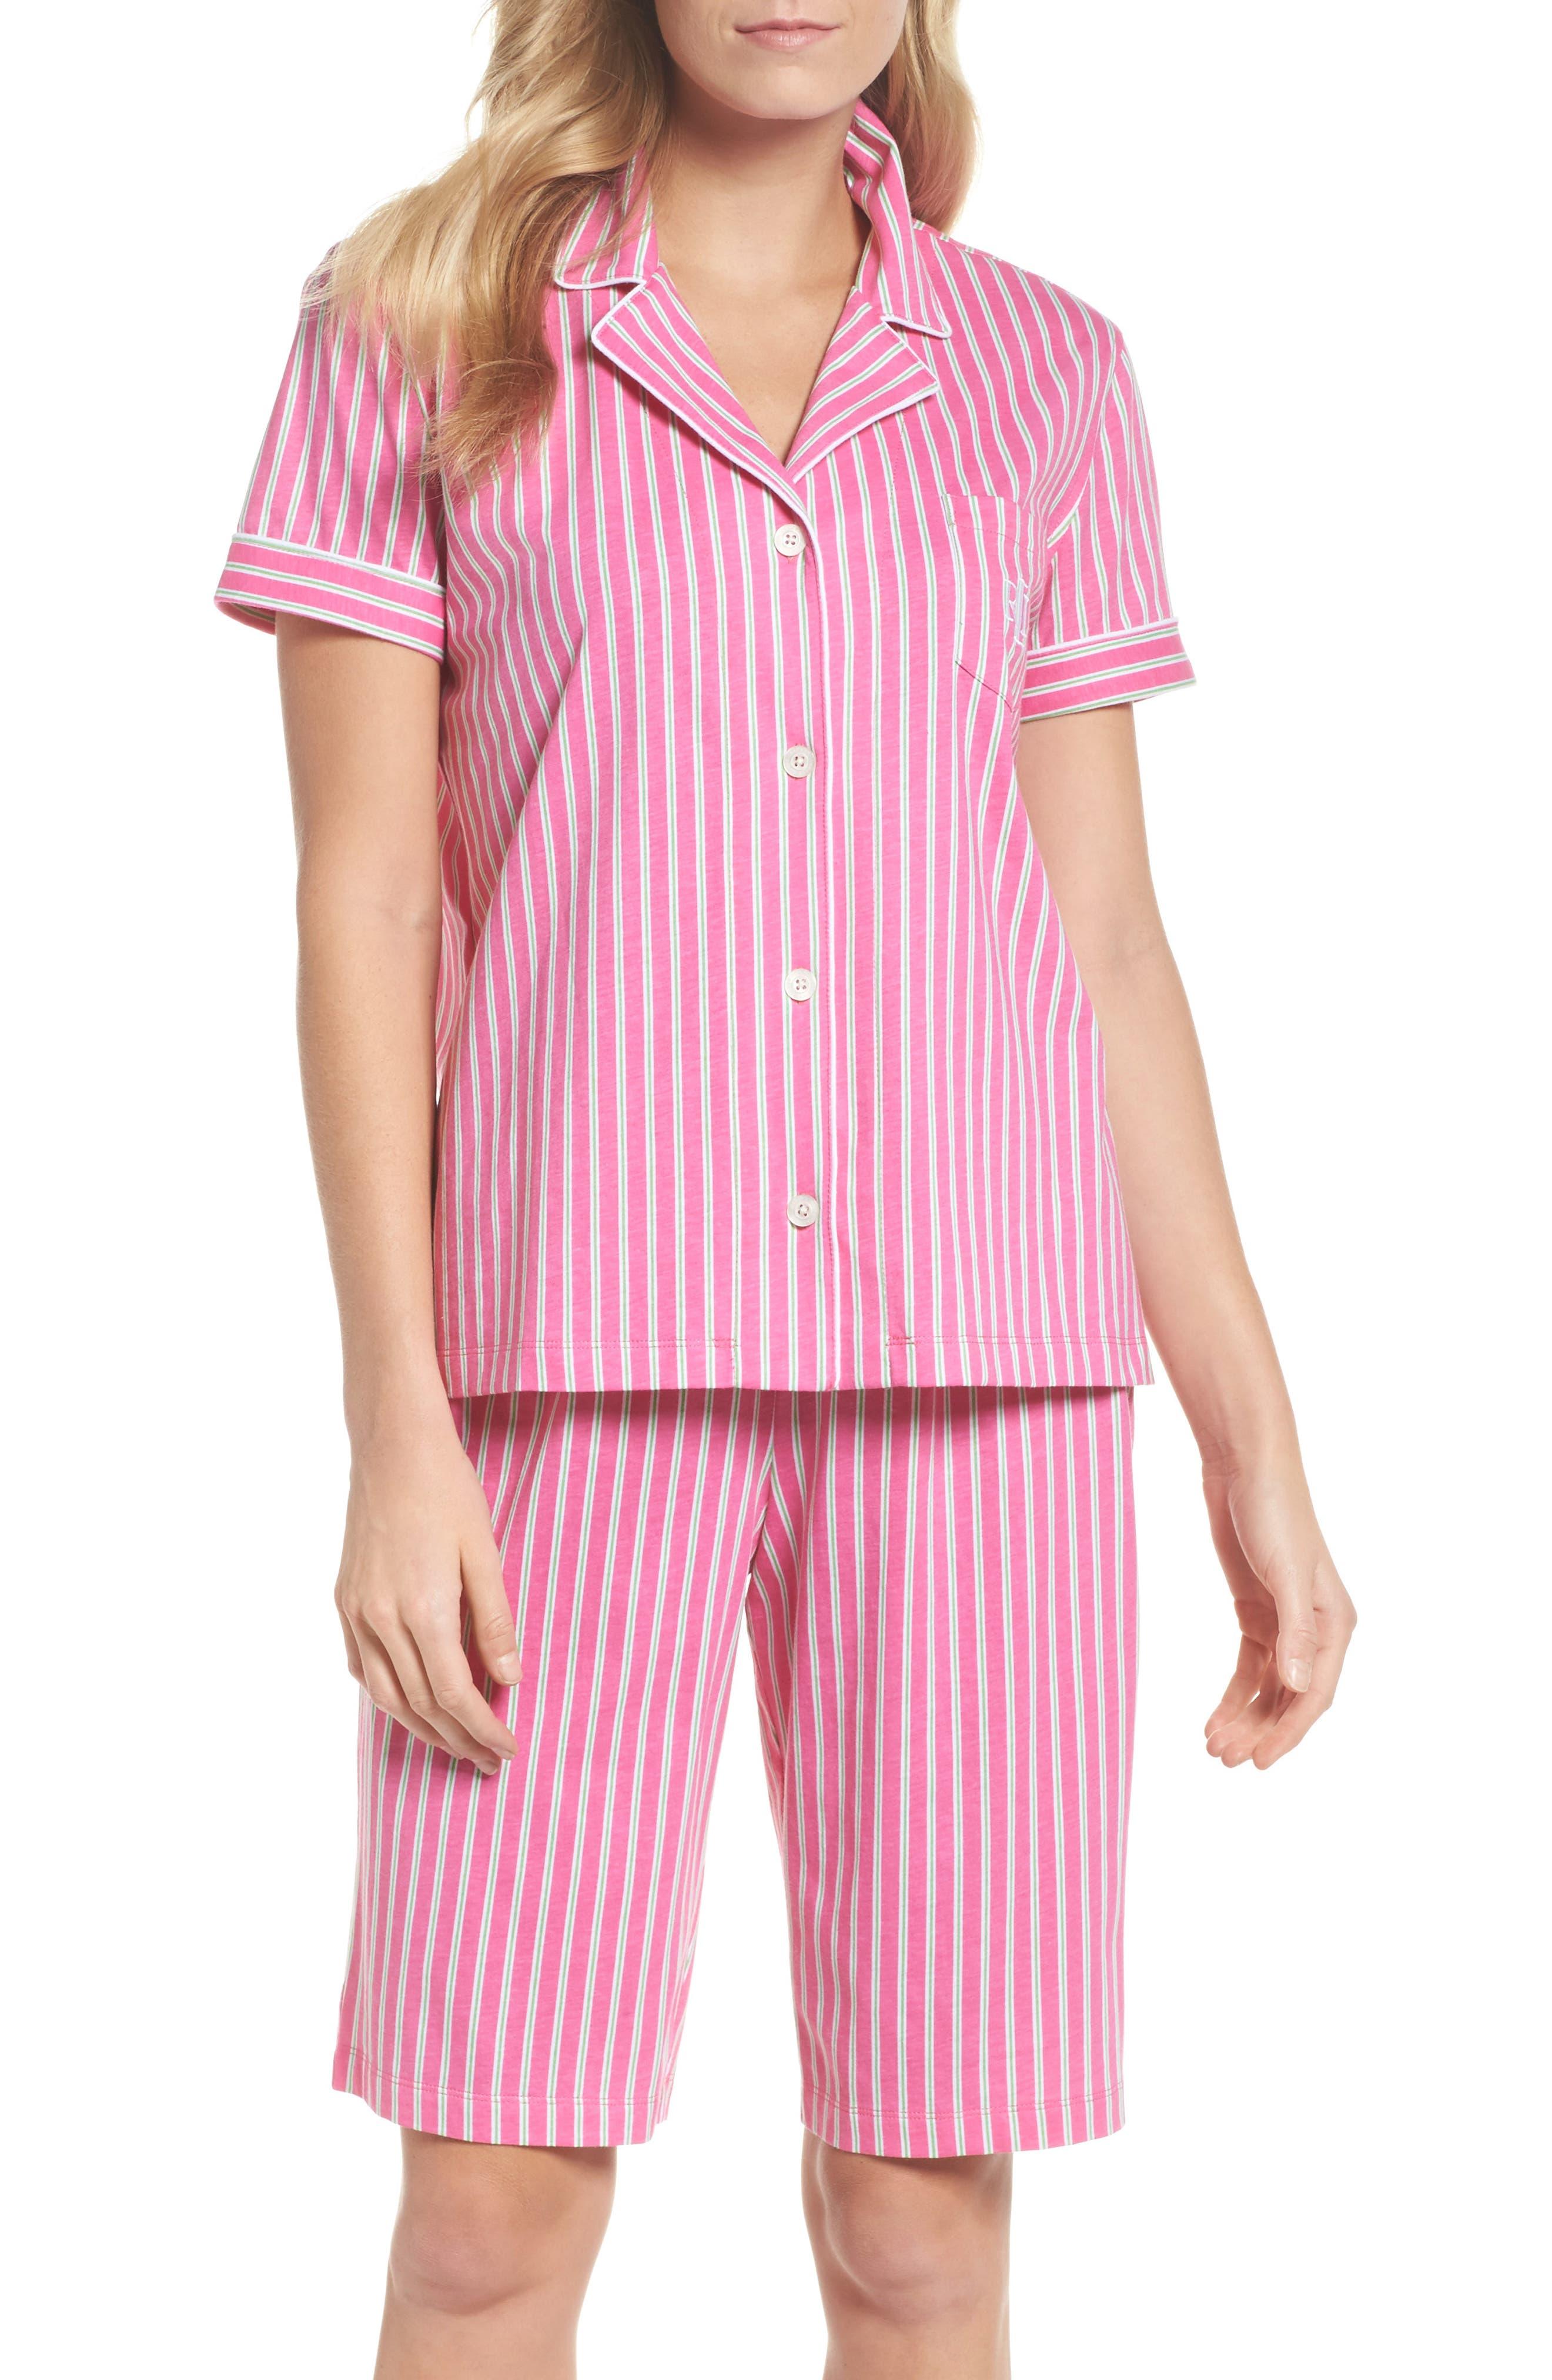 Bermuda Pajamas,                             Main thumbnail 1, color,                             674